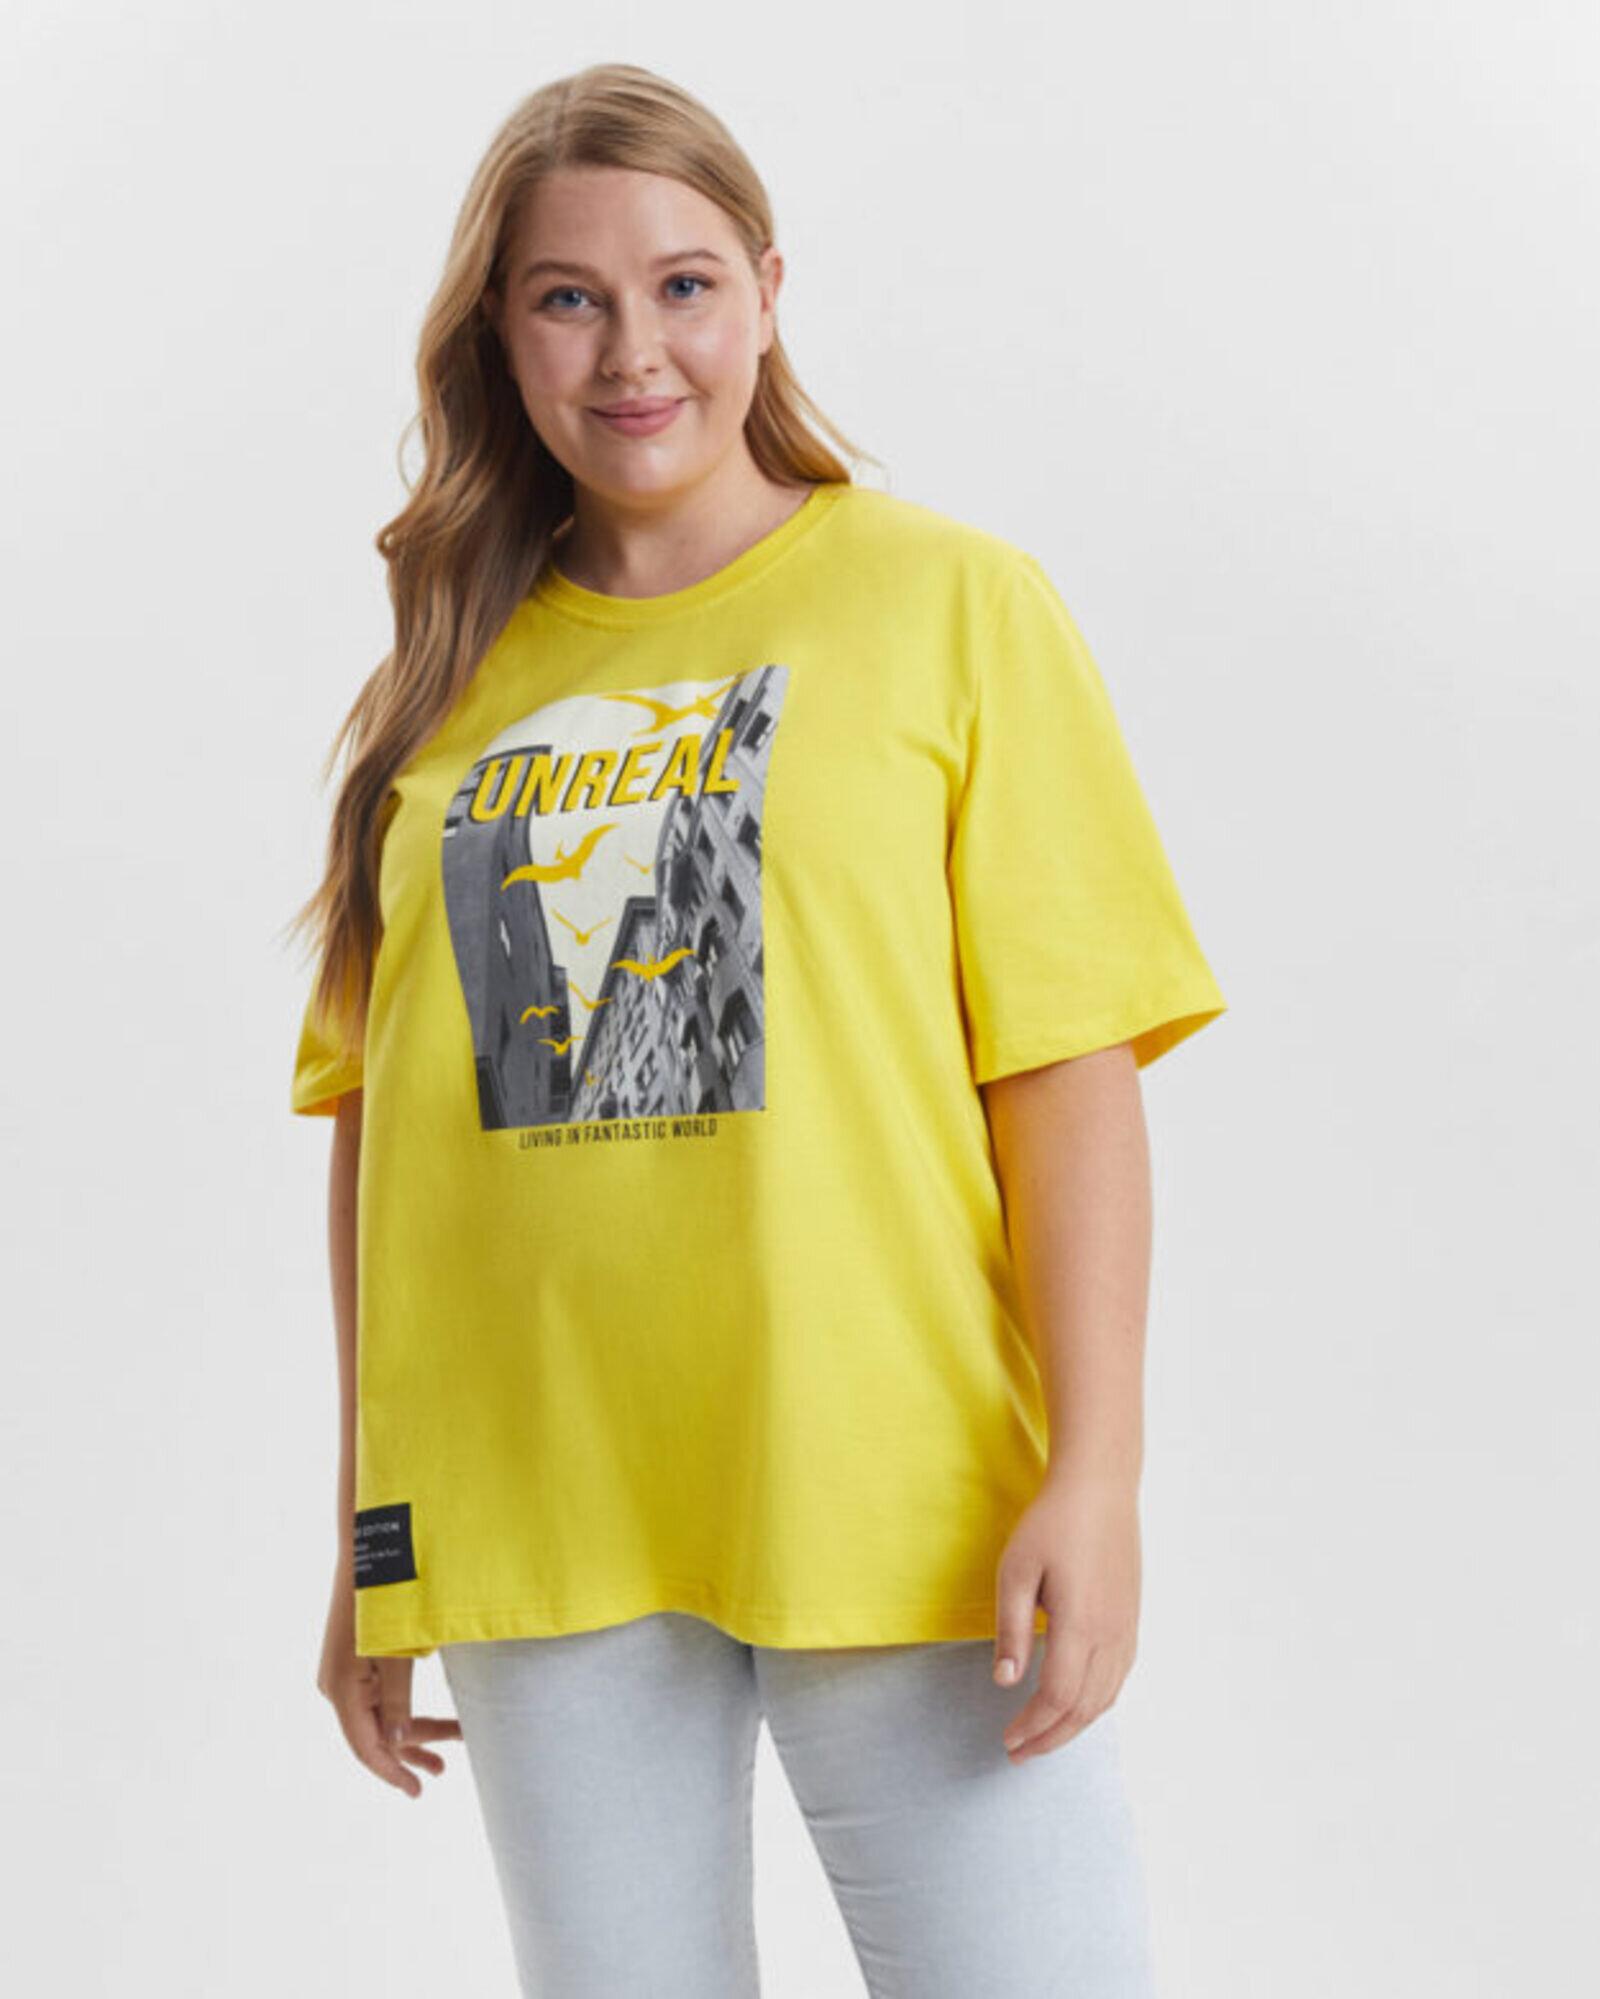 Футболка женская «Unreal» желтая Plus size